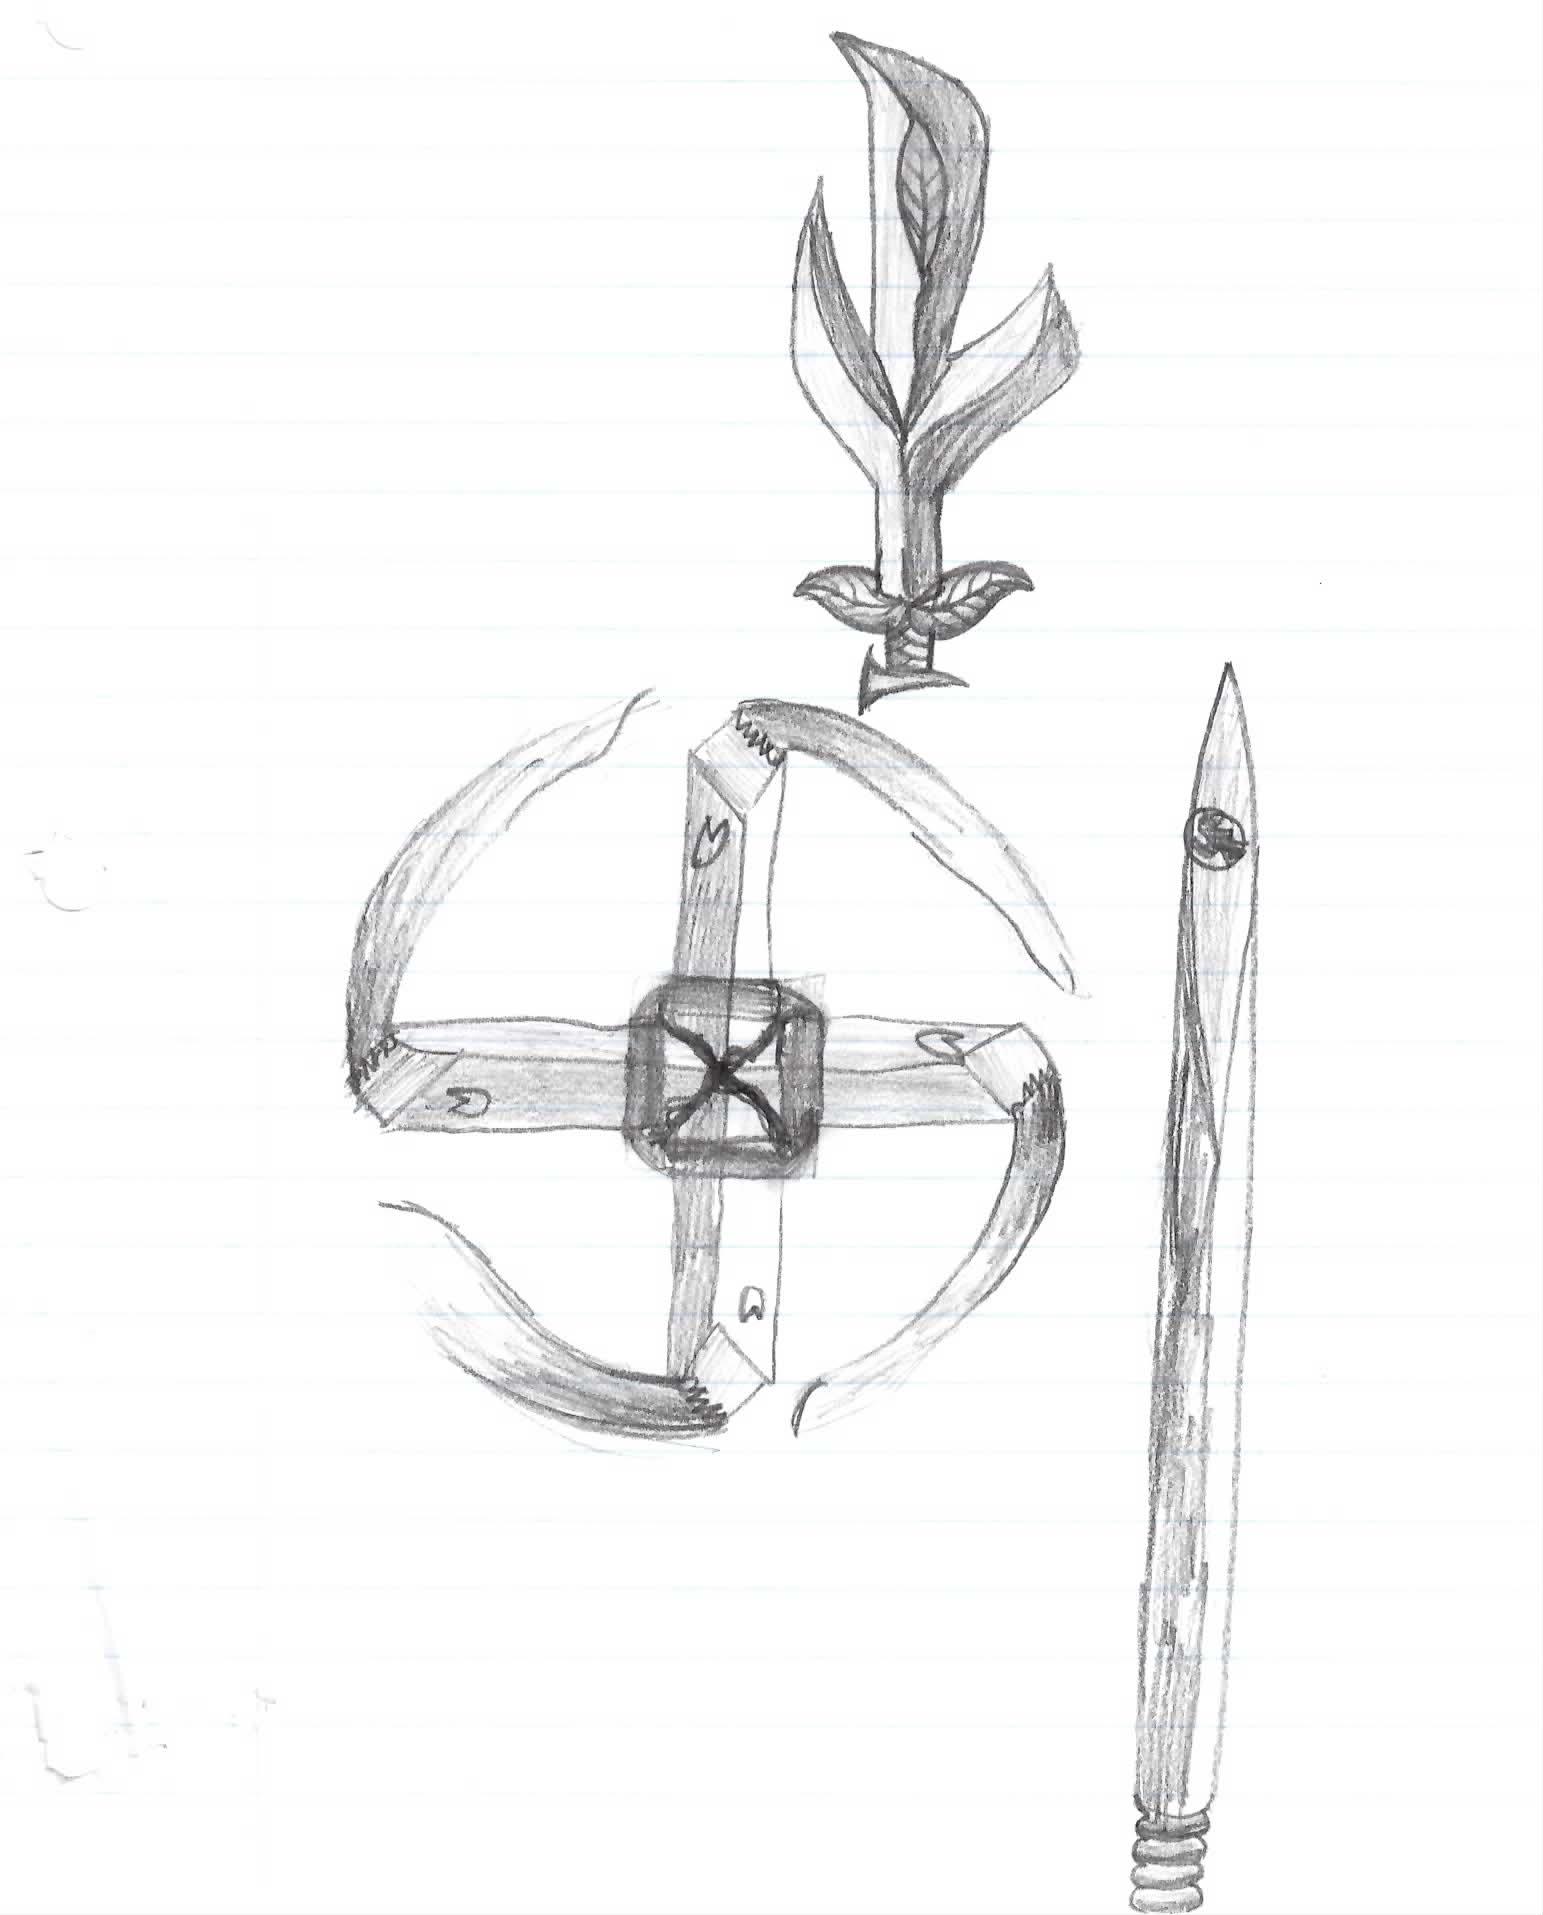 Elemental Weapons